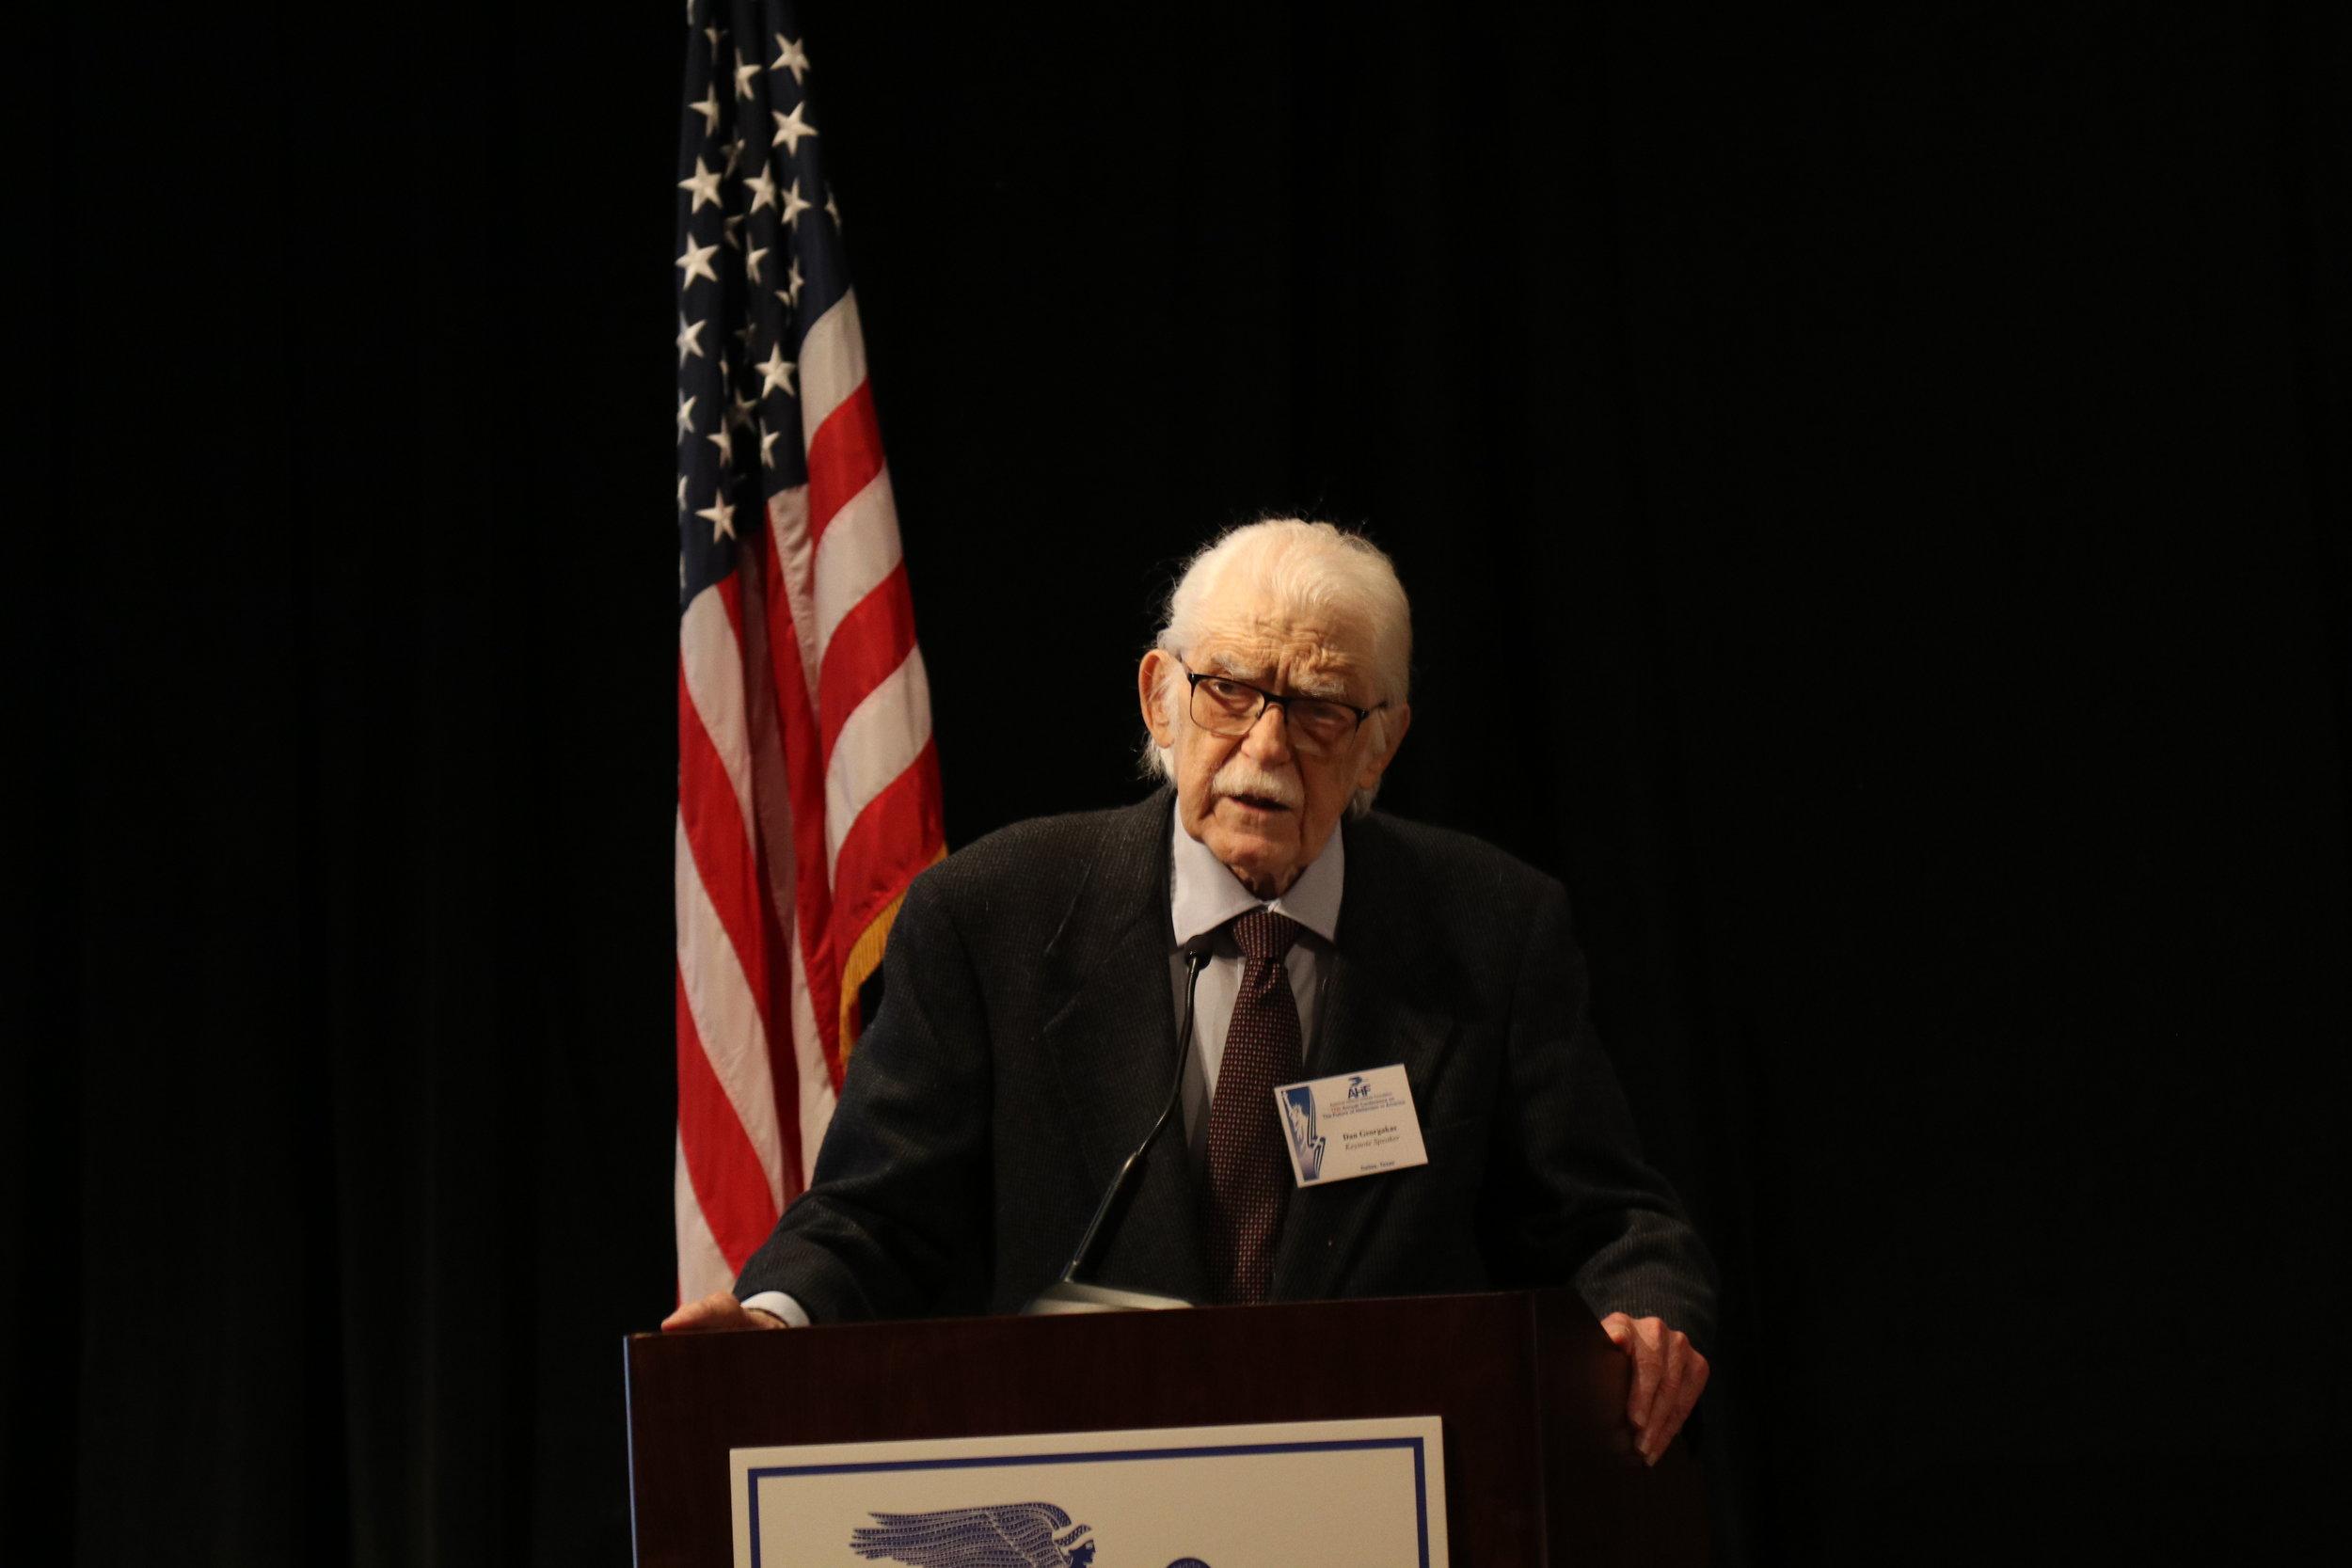 Professor Dan Georgakas provides the Opening Keynote address.